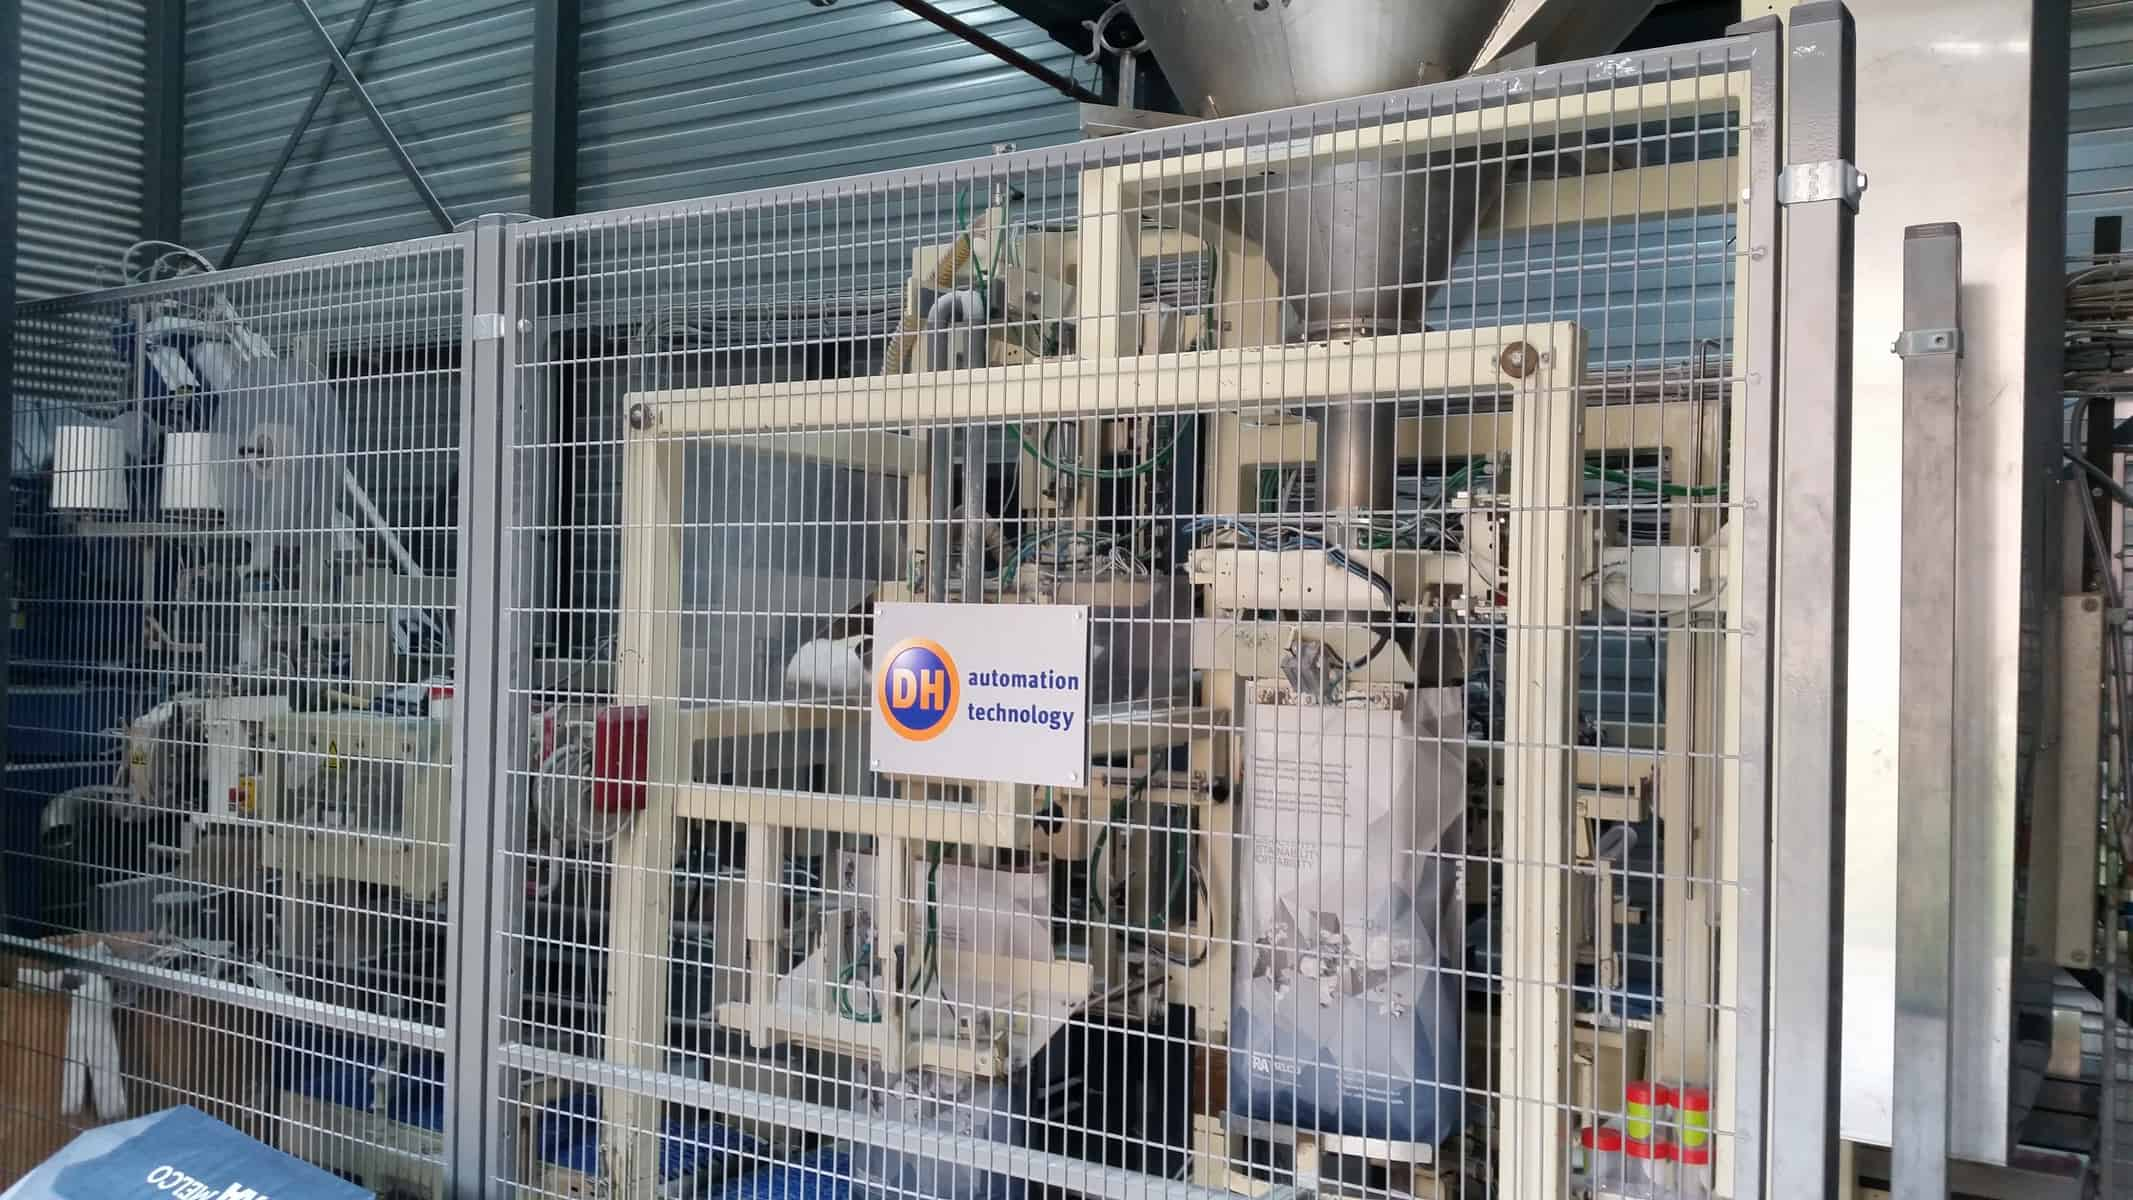 IA Productie machine automatisering